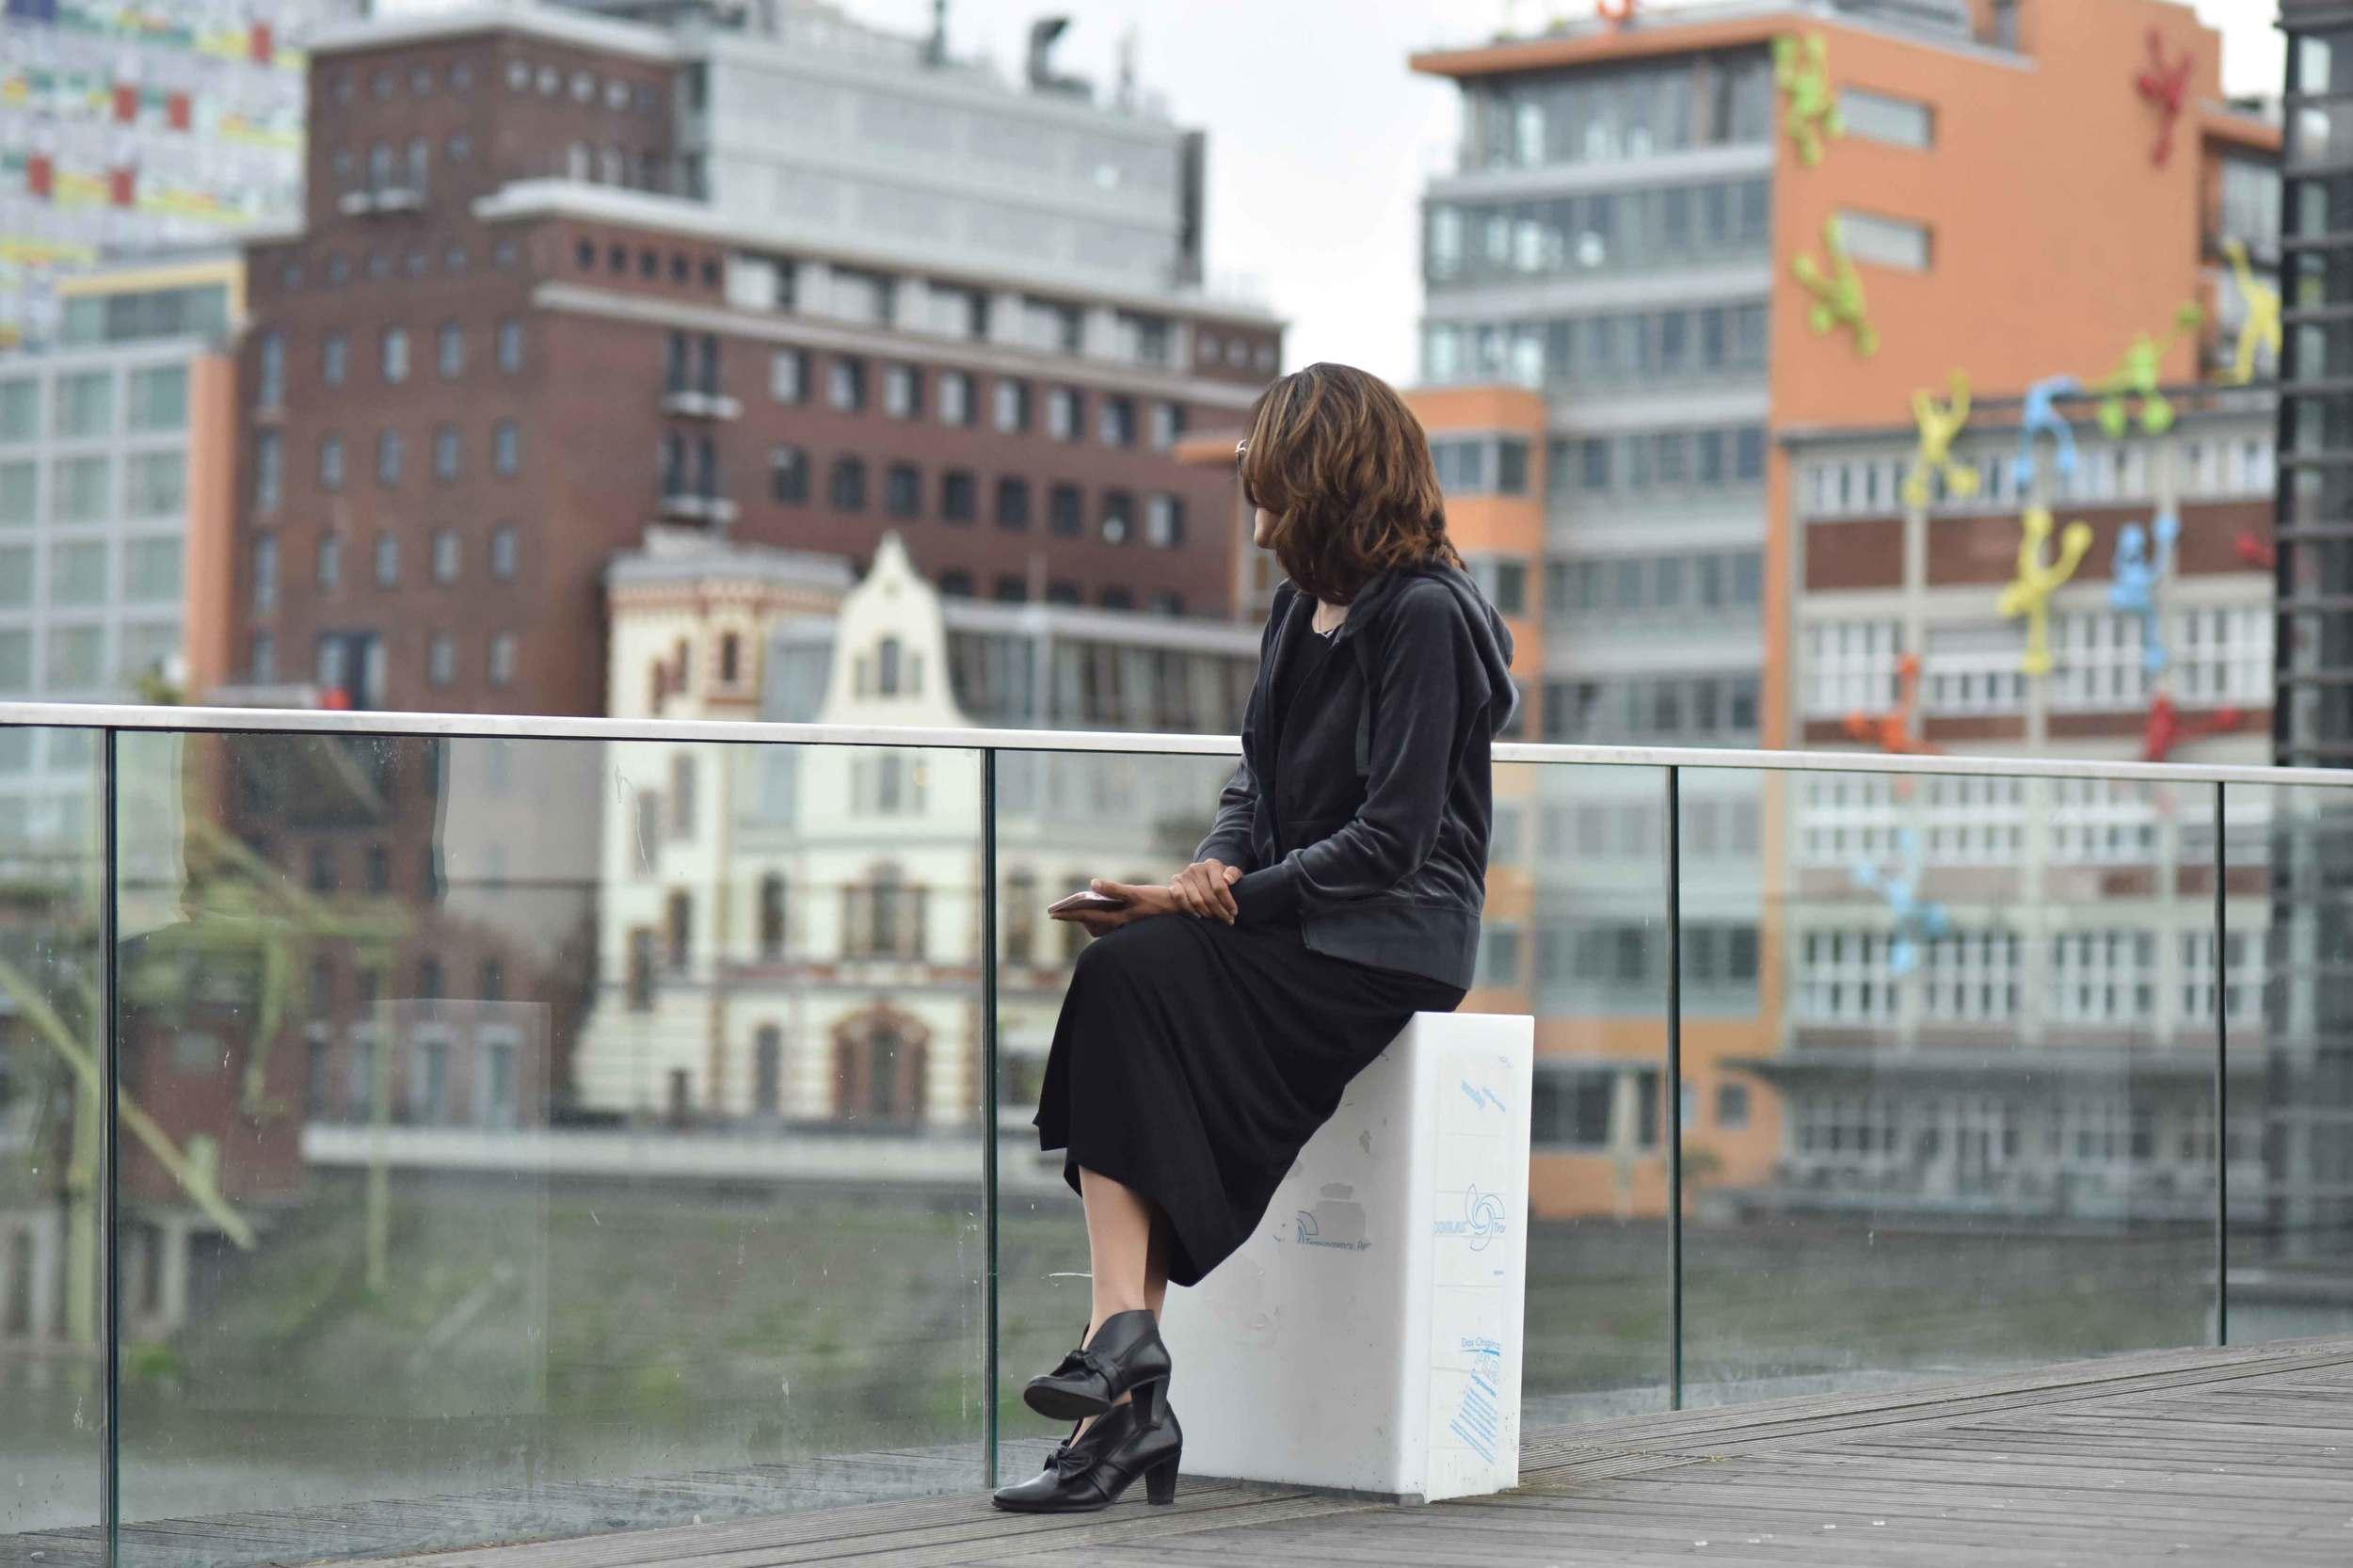 Wearing Eileen Fisher black tank dress in viscose jersey, little black dress, Gucci handbag, Eddie Bauer velour jacket, Düsseldorf harbor, Germany. Image©sourcingstyle.com, Photo: Nicola Nolting.